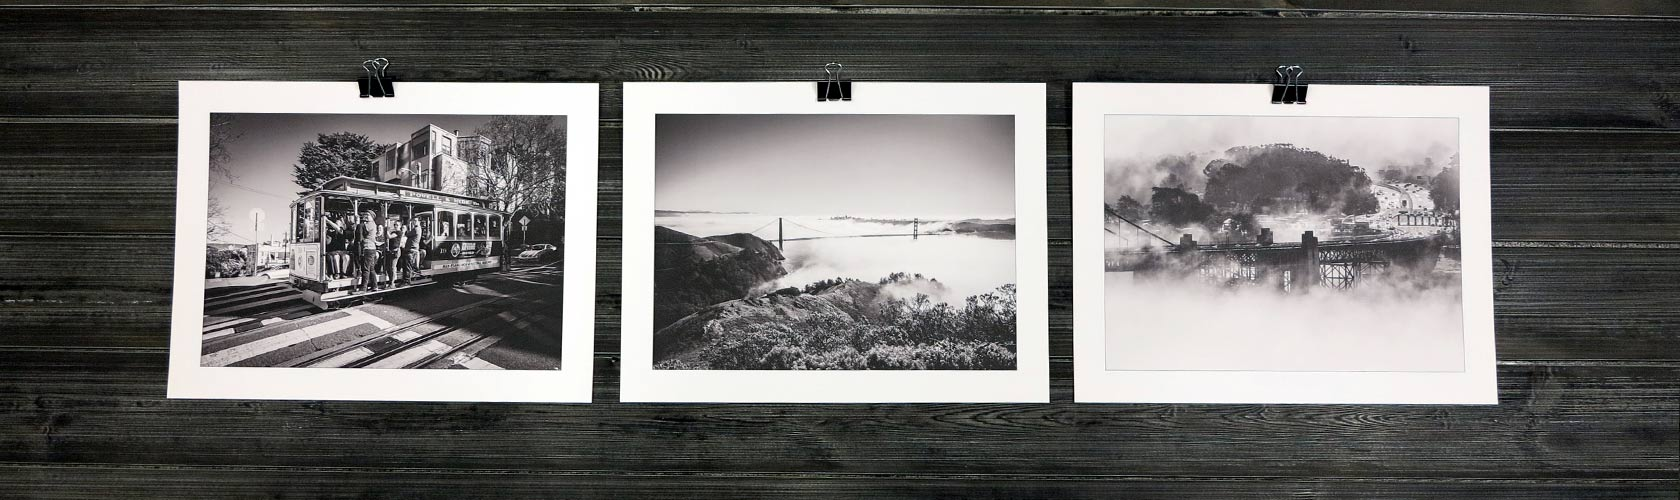 Prints 21x30